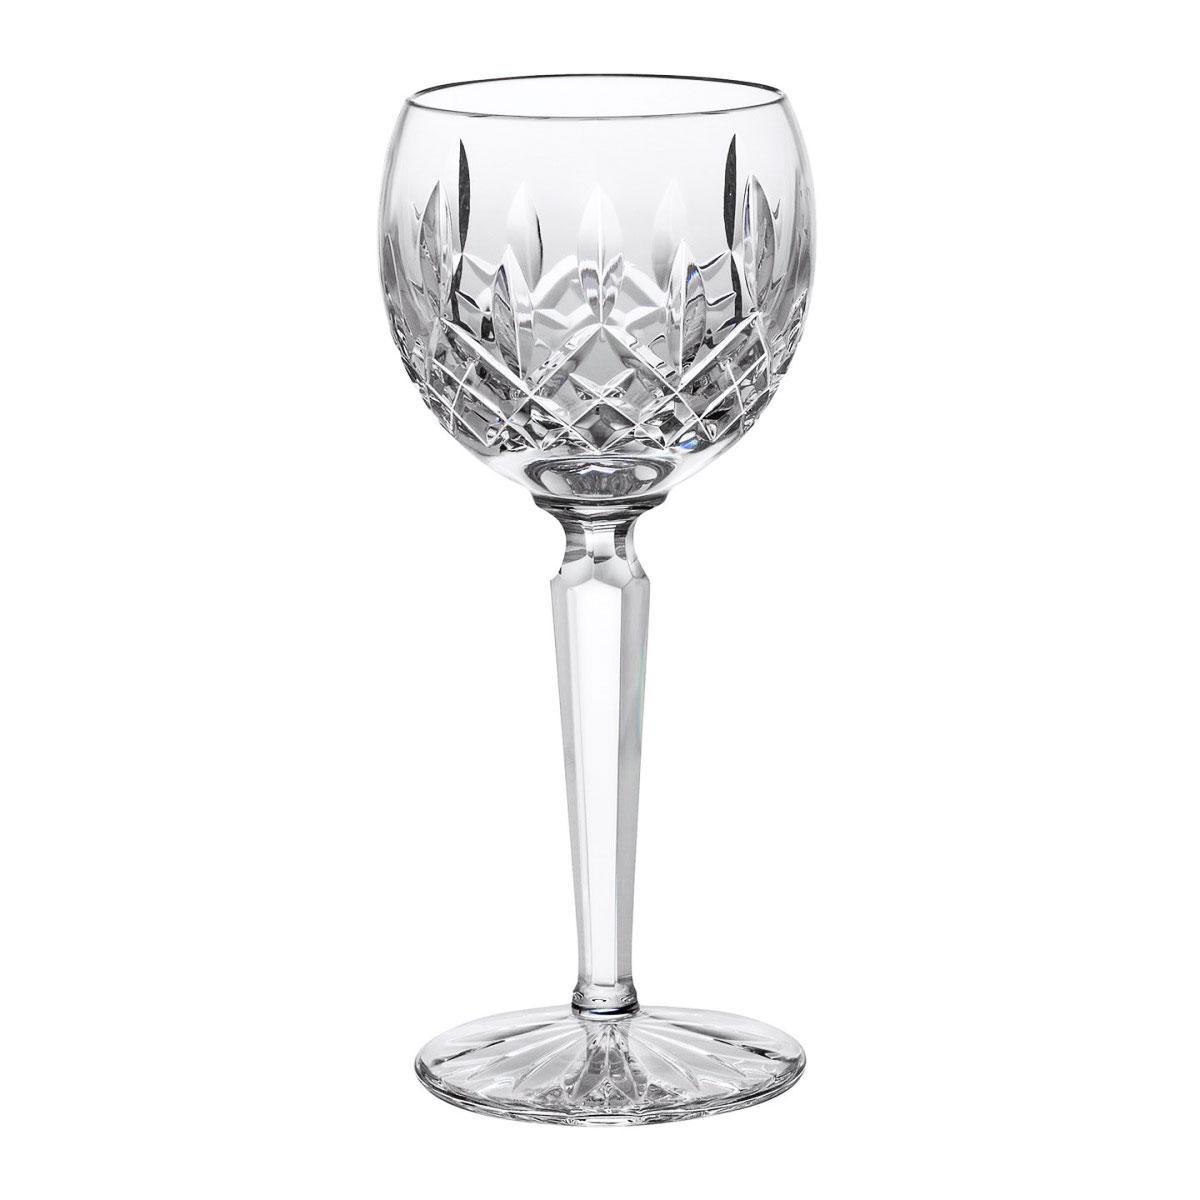 Waterford Crystal, Lismore Hock Crystal Wine Glass, Single